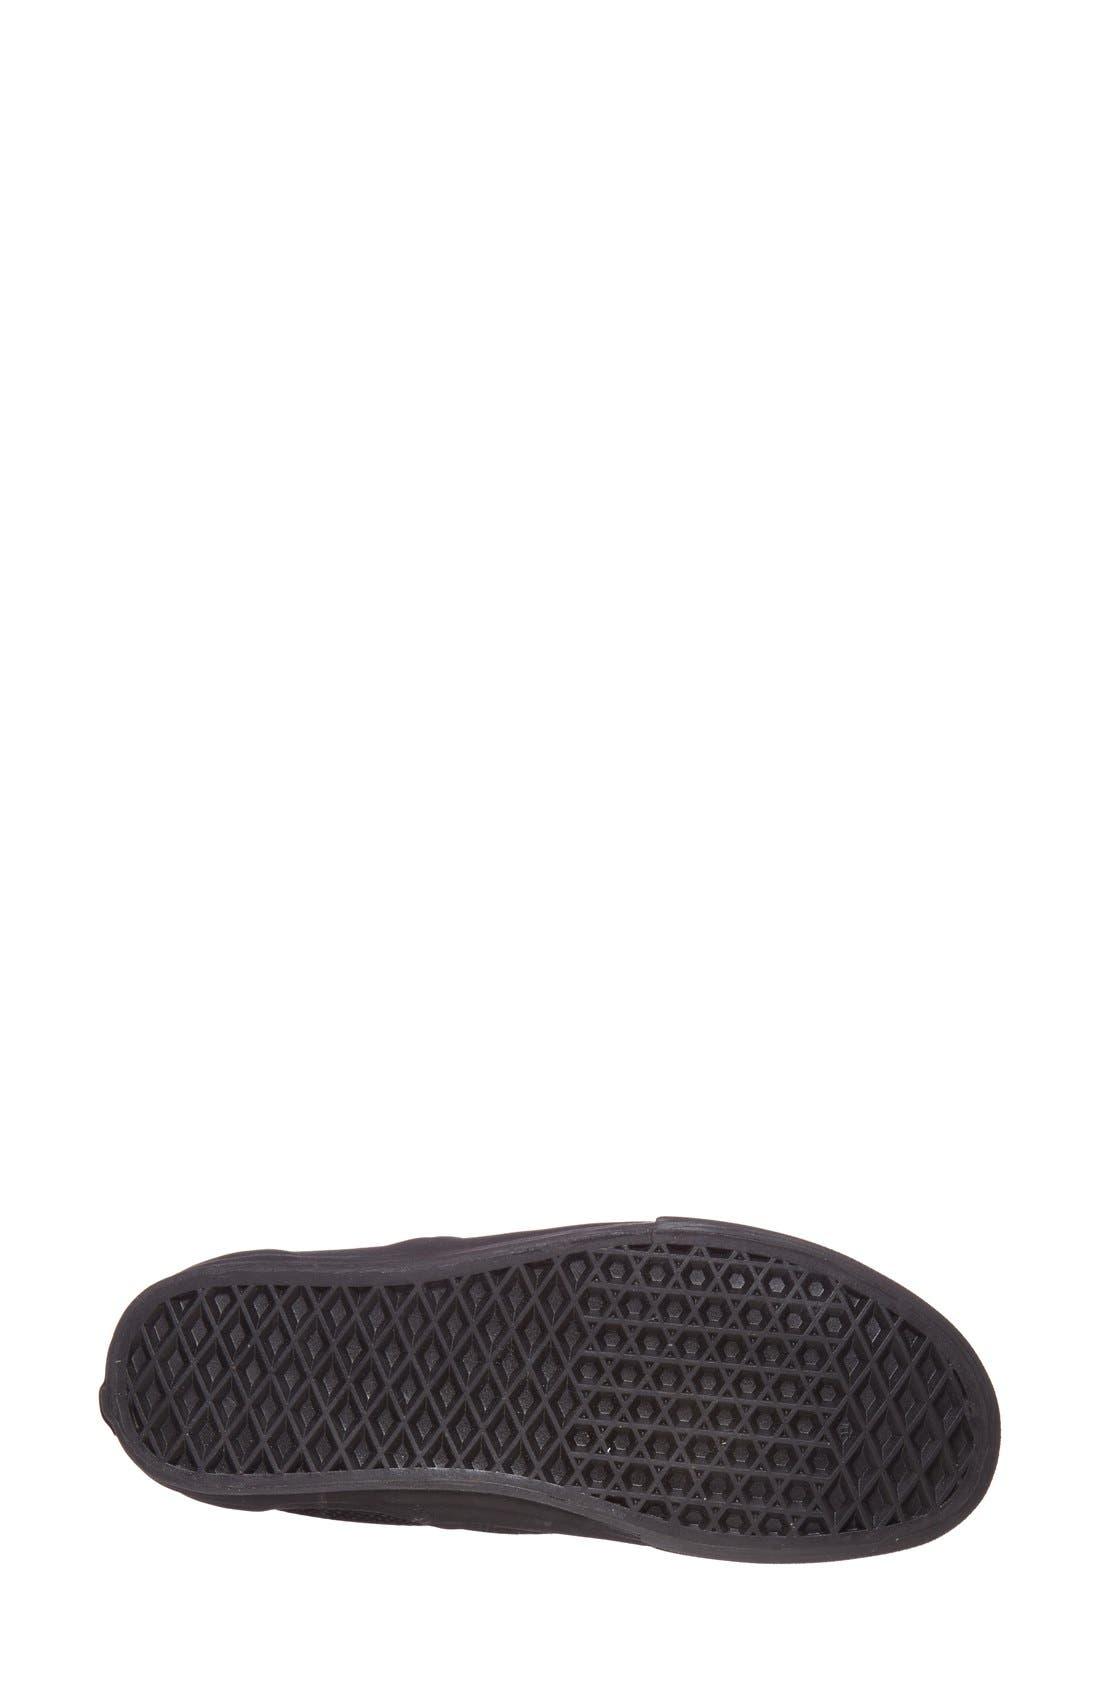 Alternate Image 4  - Vans 'Classic - Perforated' Slip-On Sneaker (Women)